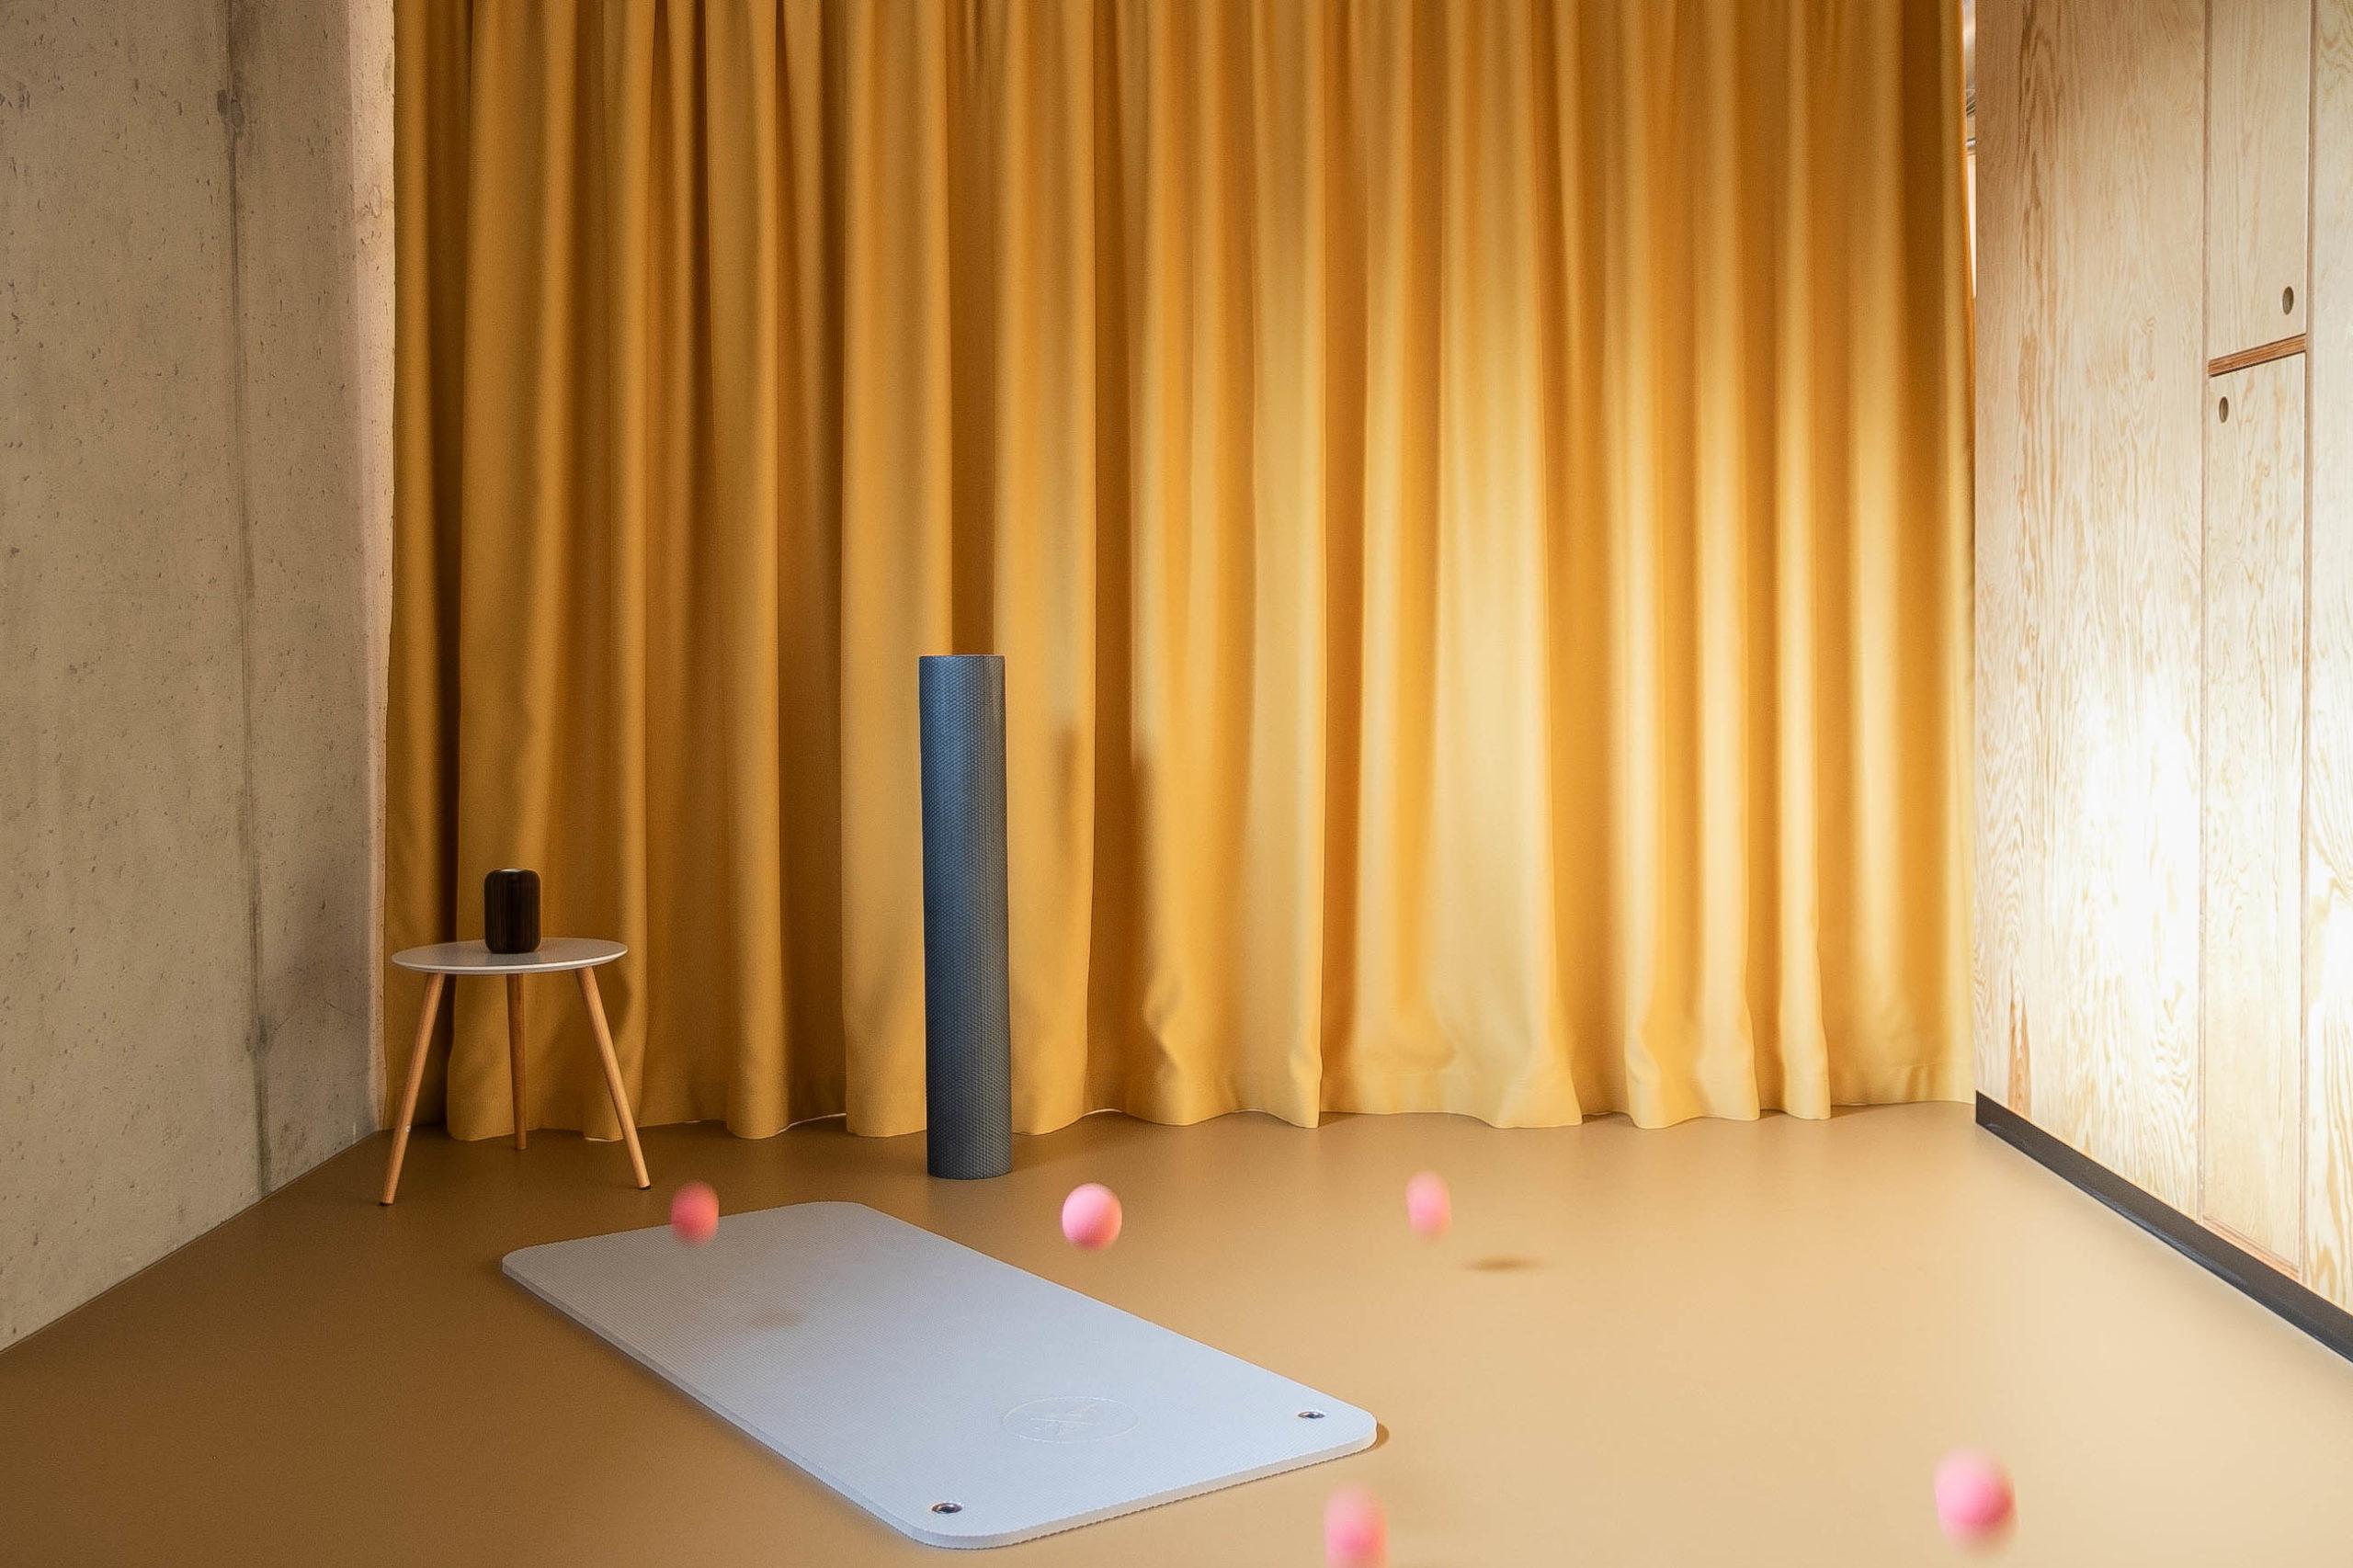 Studio Pilates Art v Klánovicích - interiér studia. Autor: Kurz architekti